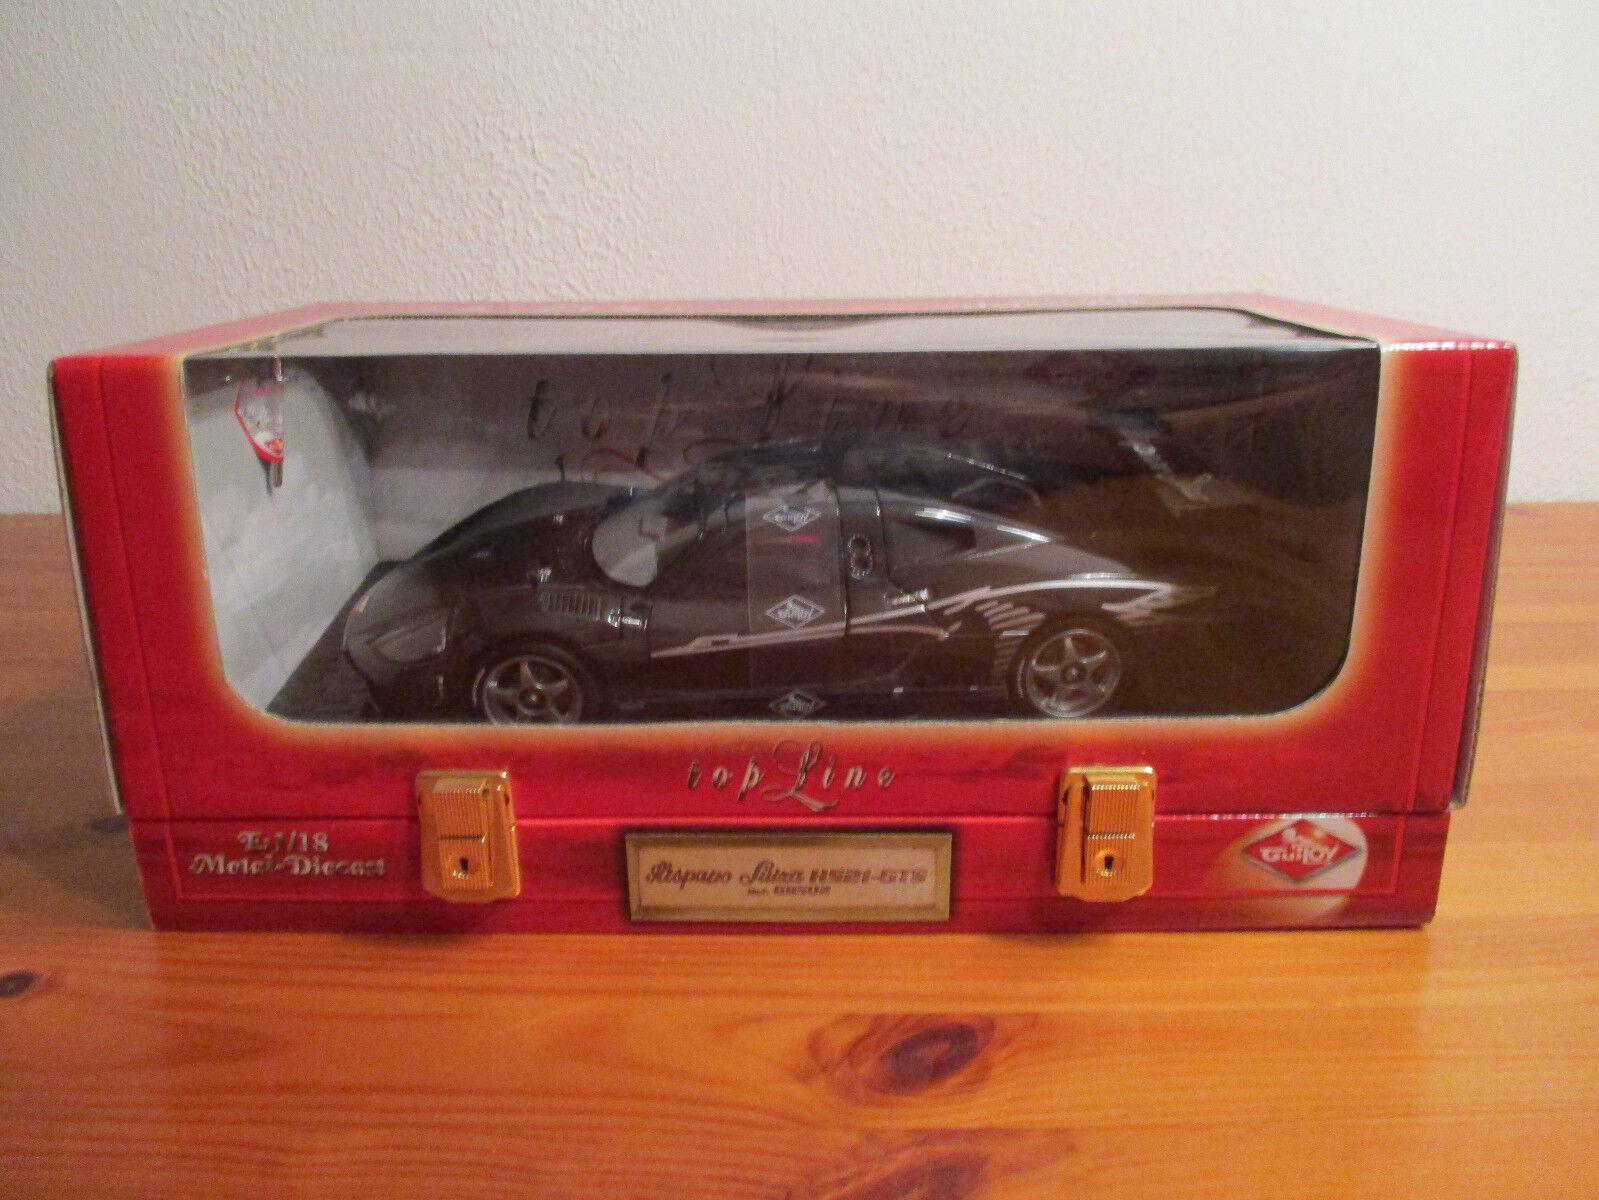 (') 1,18 guiloy hispano - suiza hs 21 - gts neue original - box